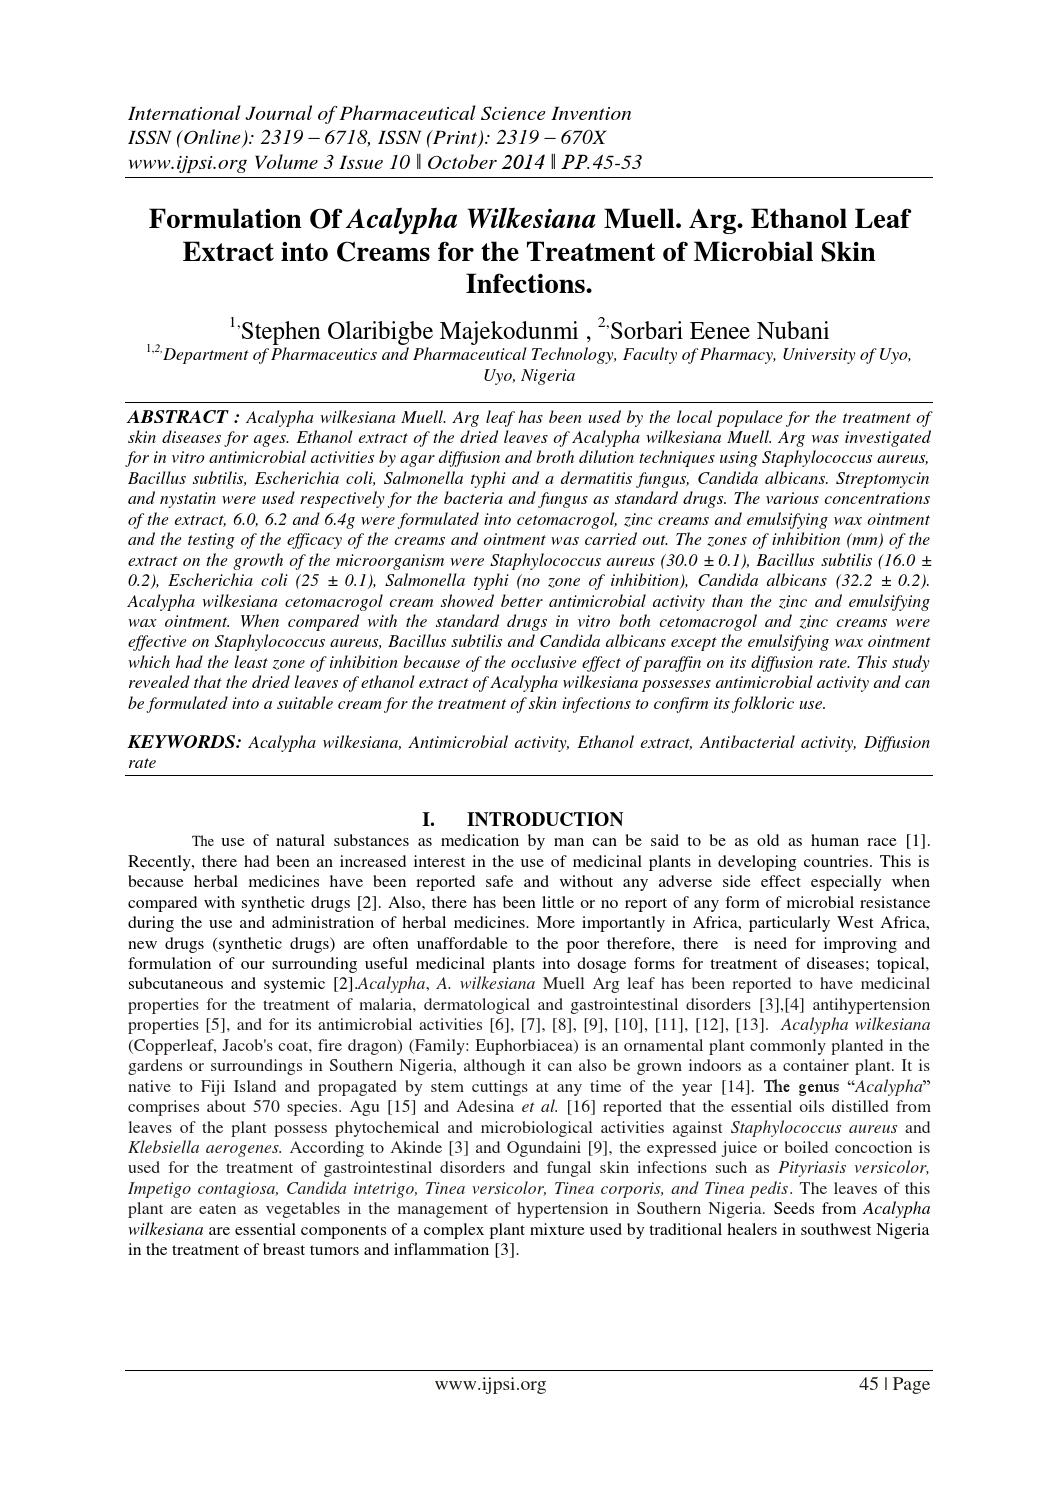 Formulation Of Acalypha Wilkesiana Muell  Arg  Ethanol Leaf